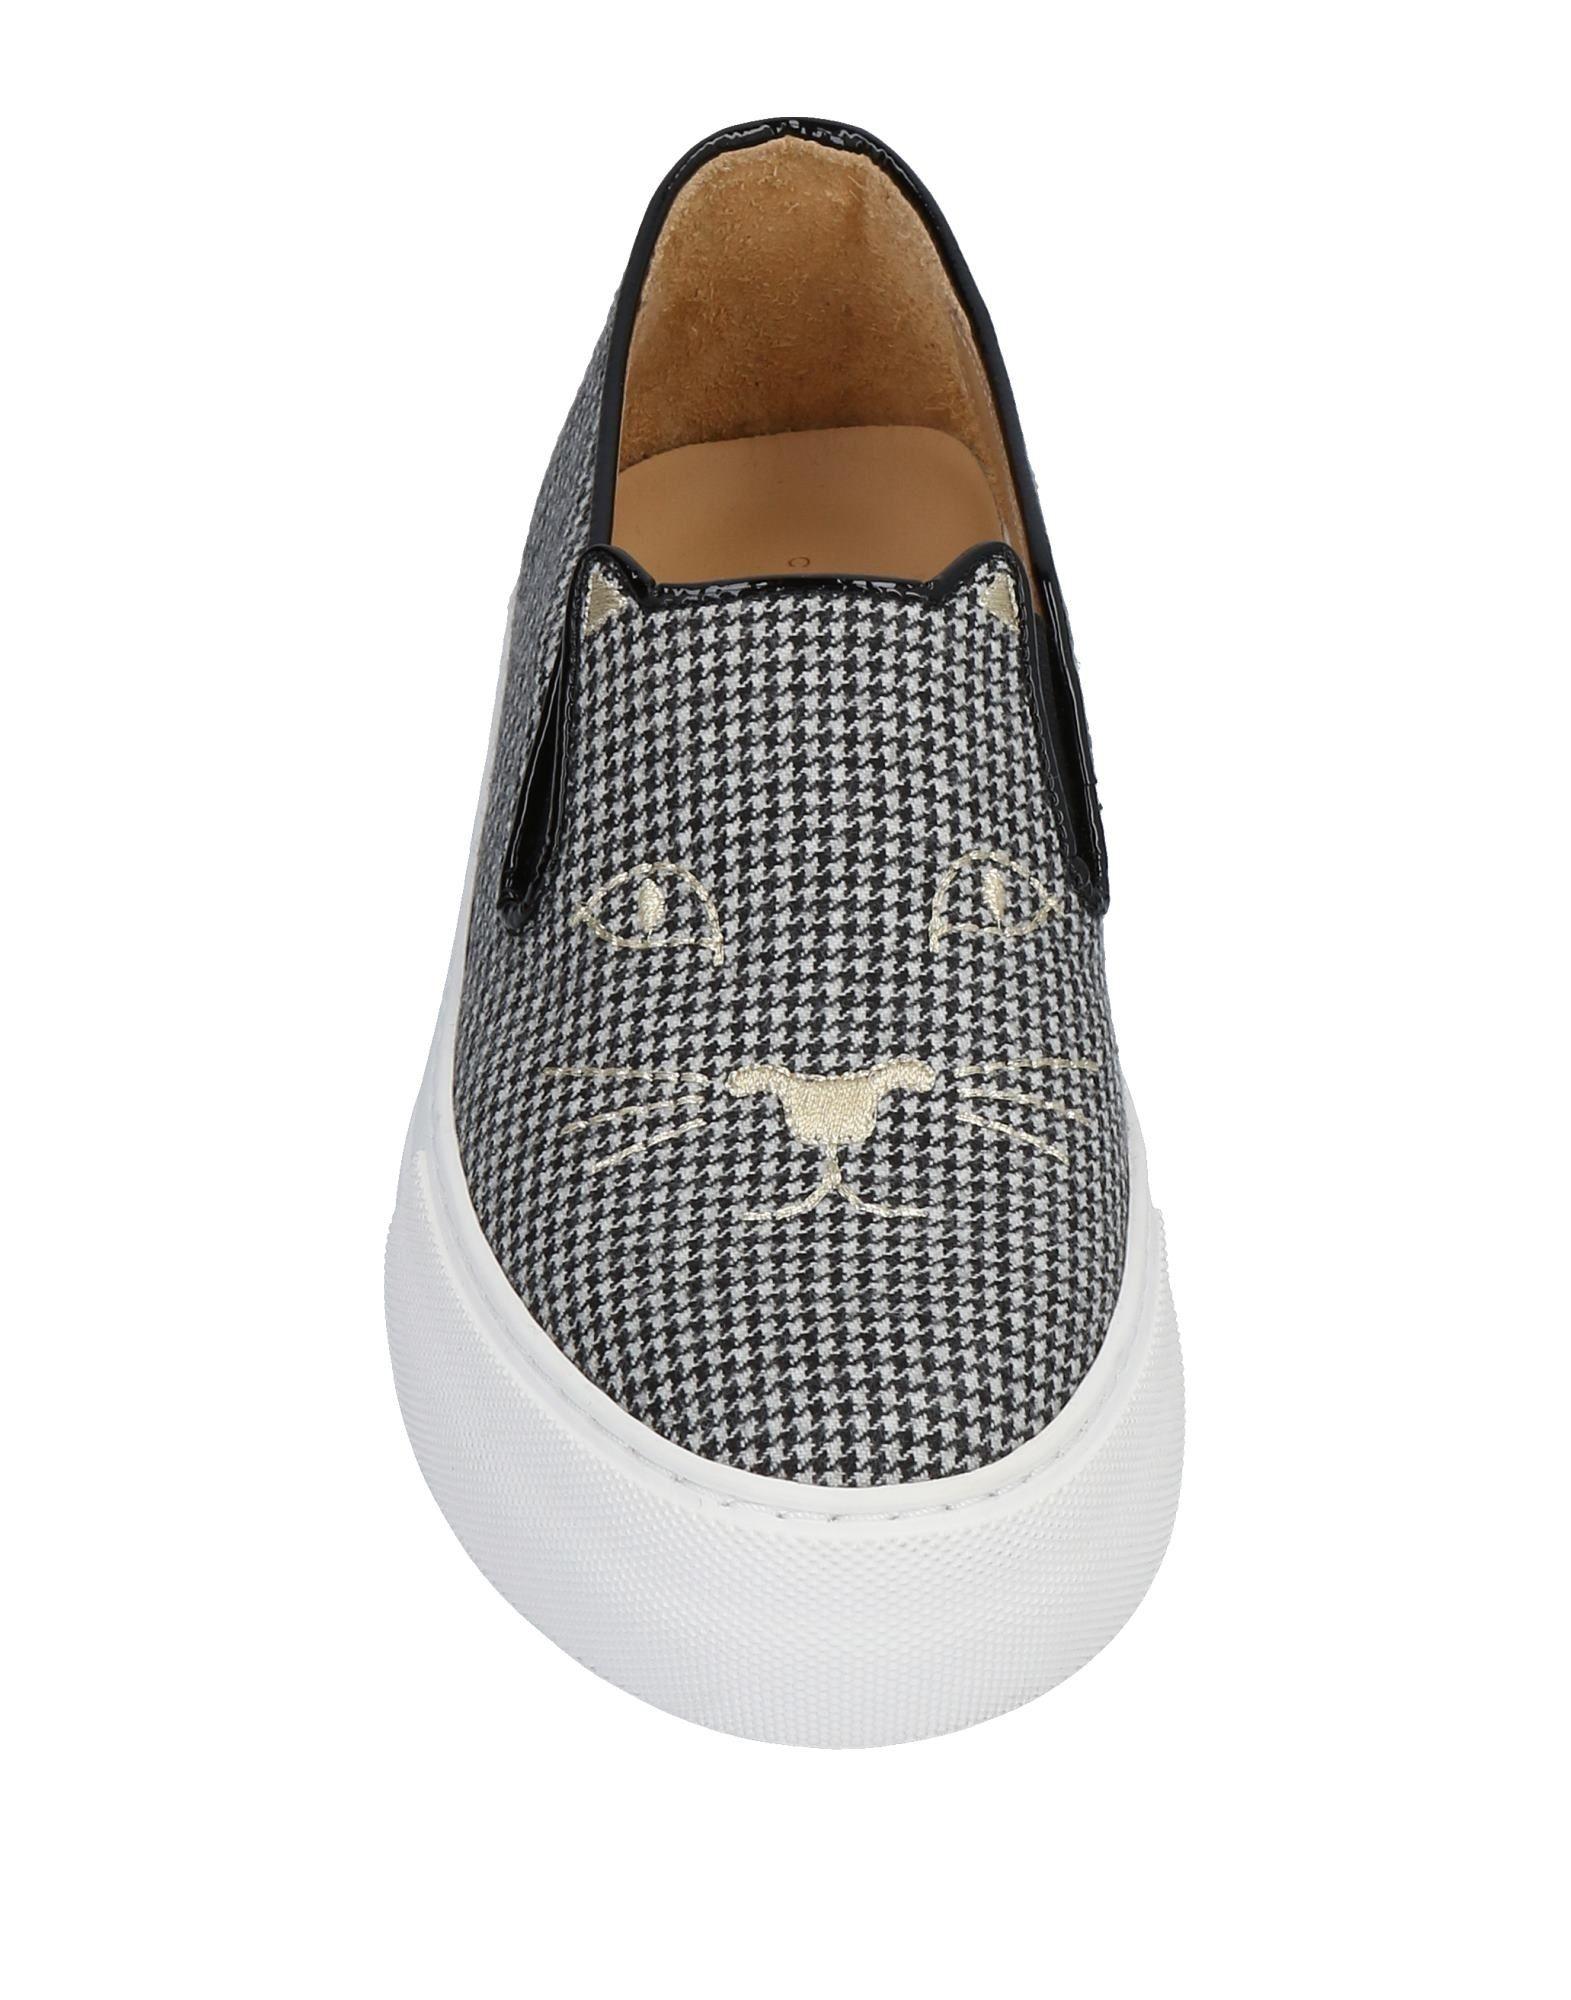 Rabatt Schuhe Charlotte Olympia Sneakers Damen   Damen 11480998ME bf25cc